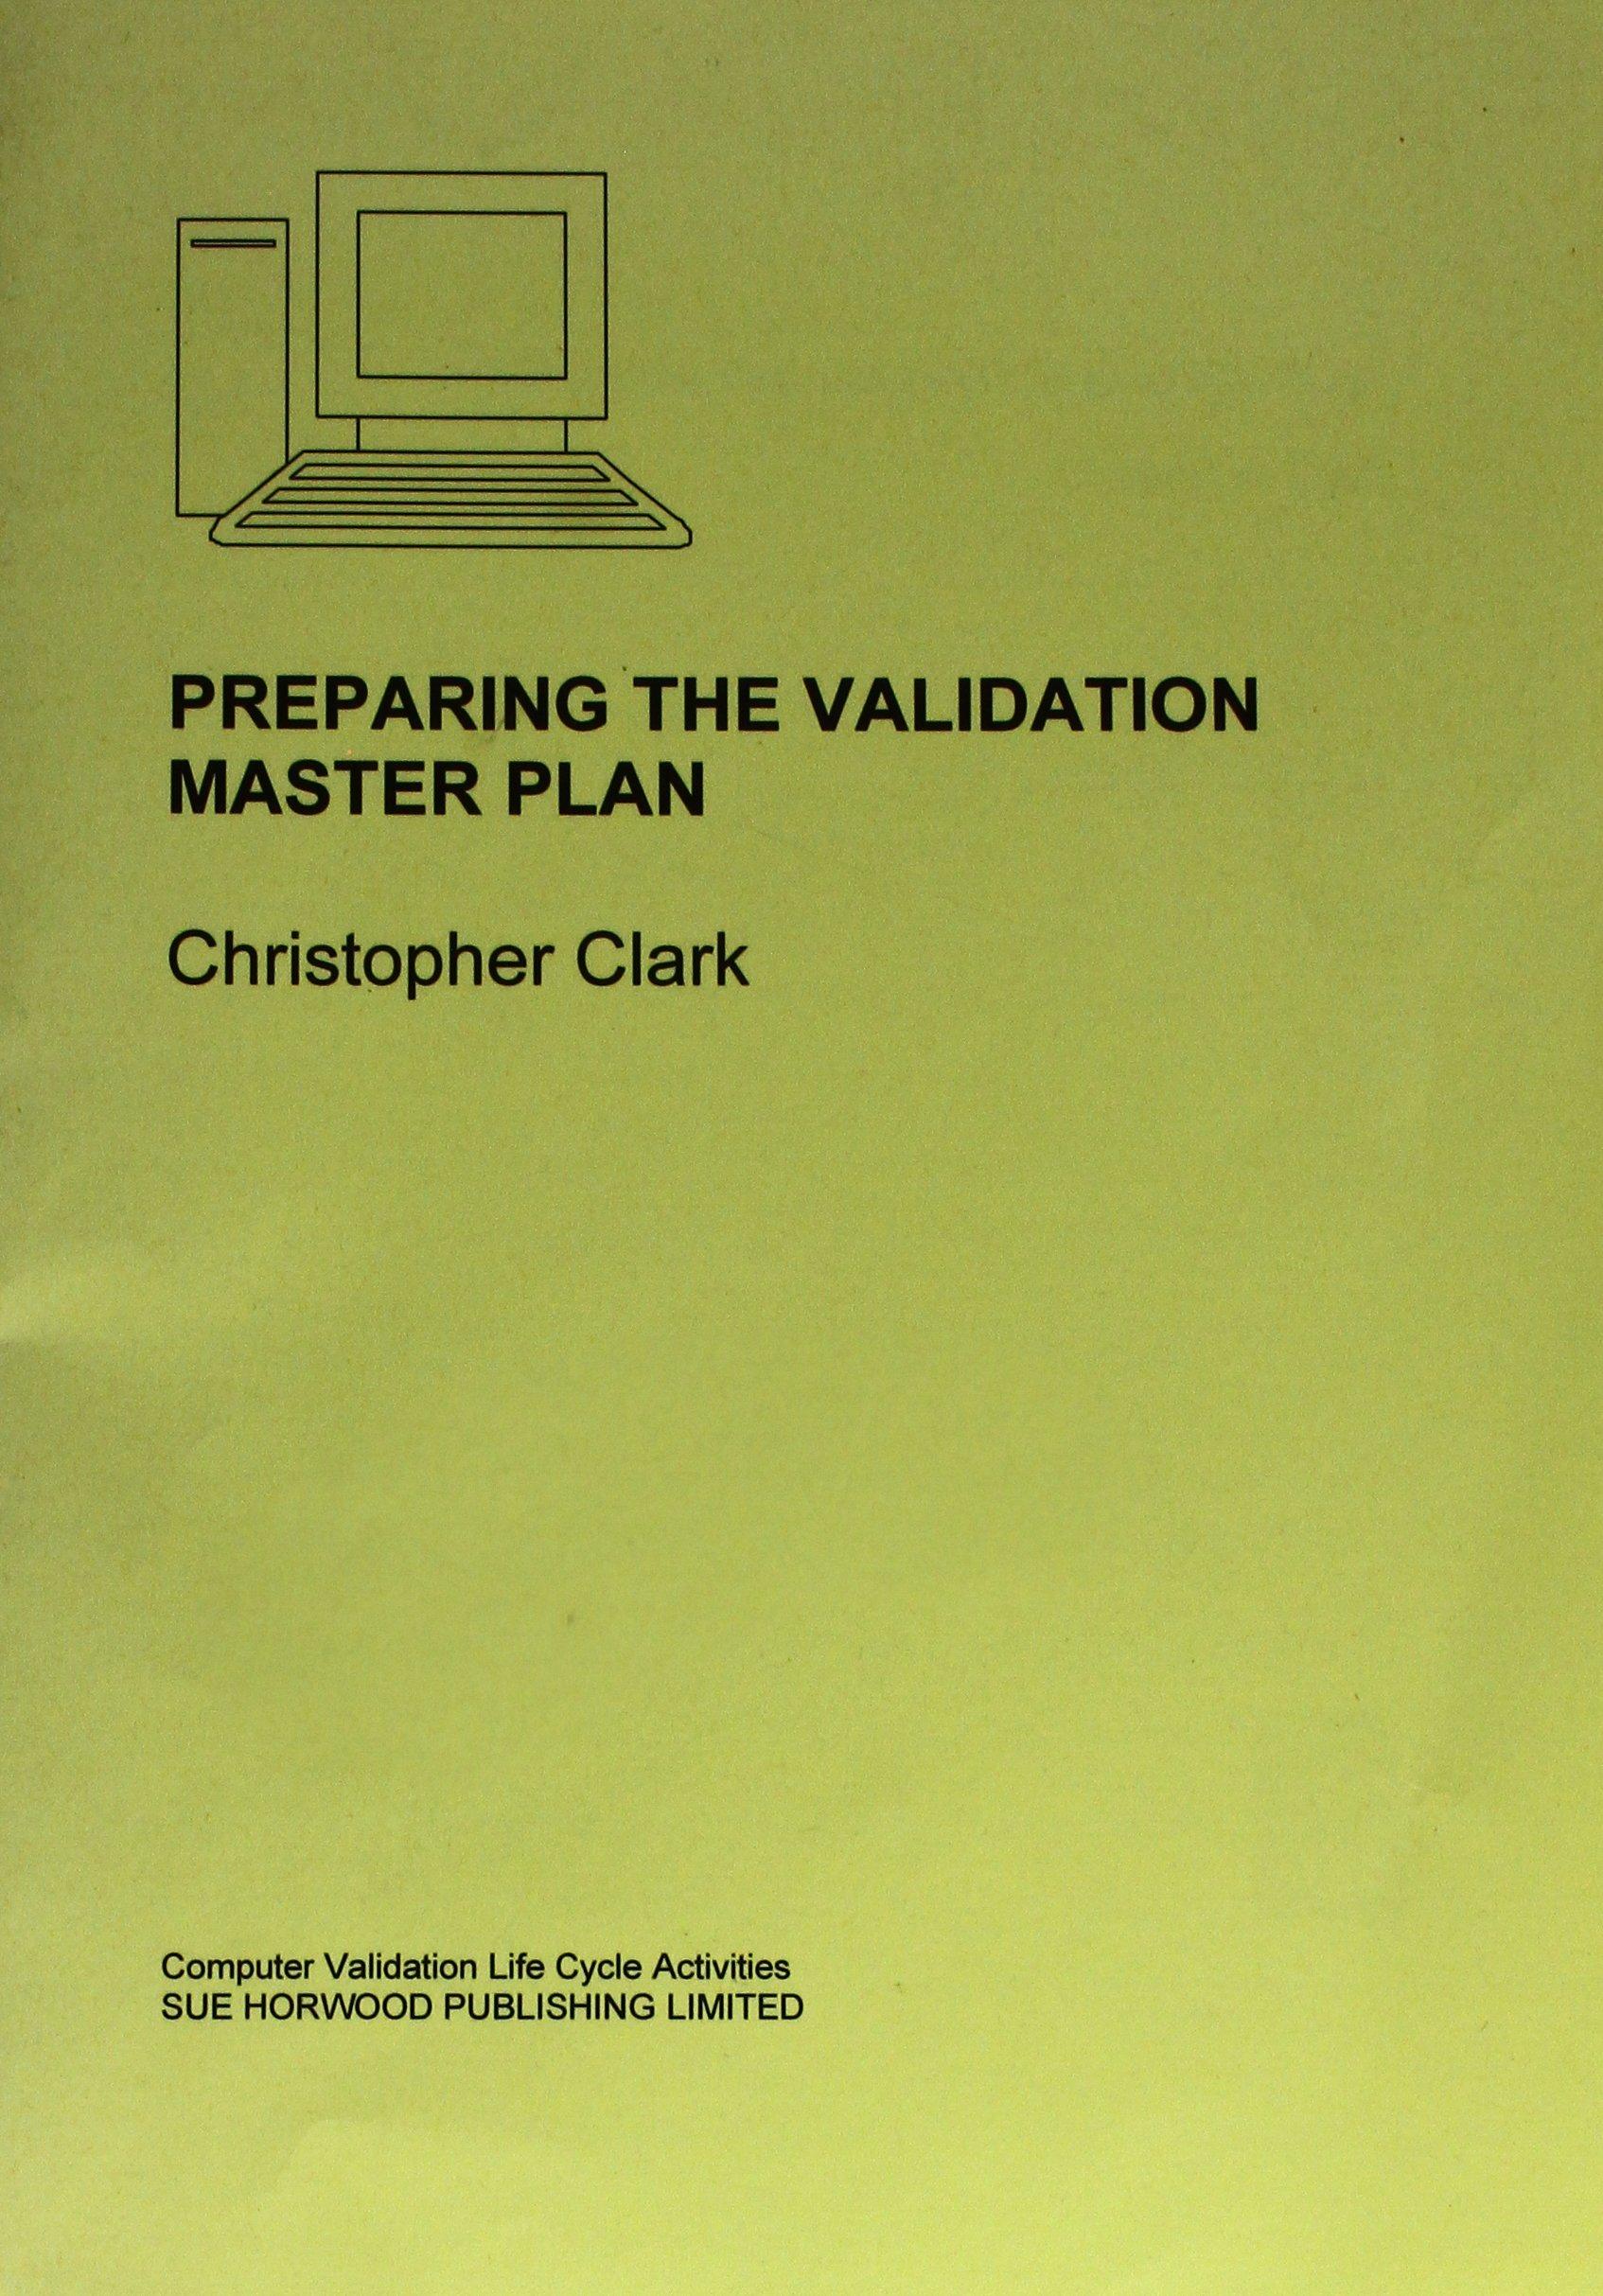 Preparing the Validation Master Plan: Computer Systems Validation Life Cycle Activities pdf